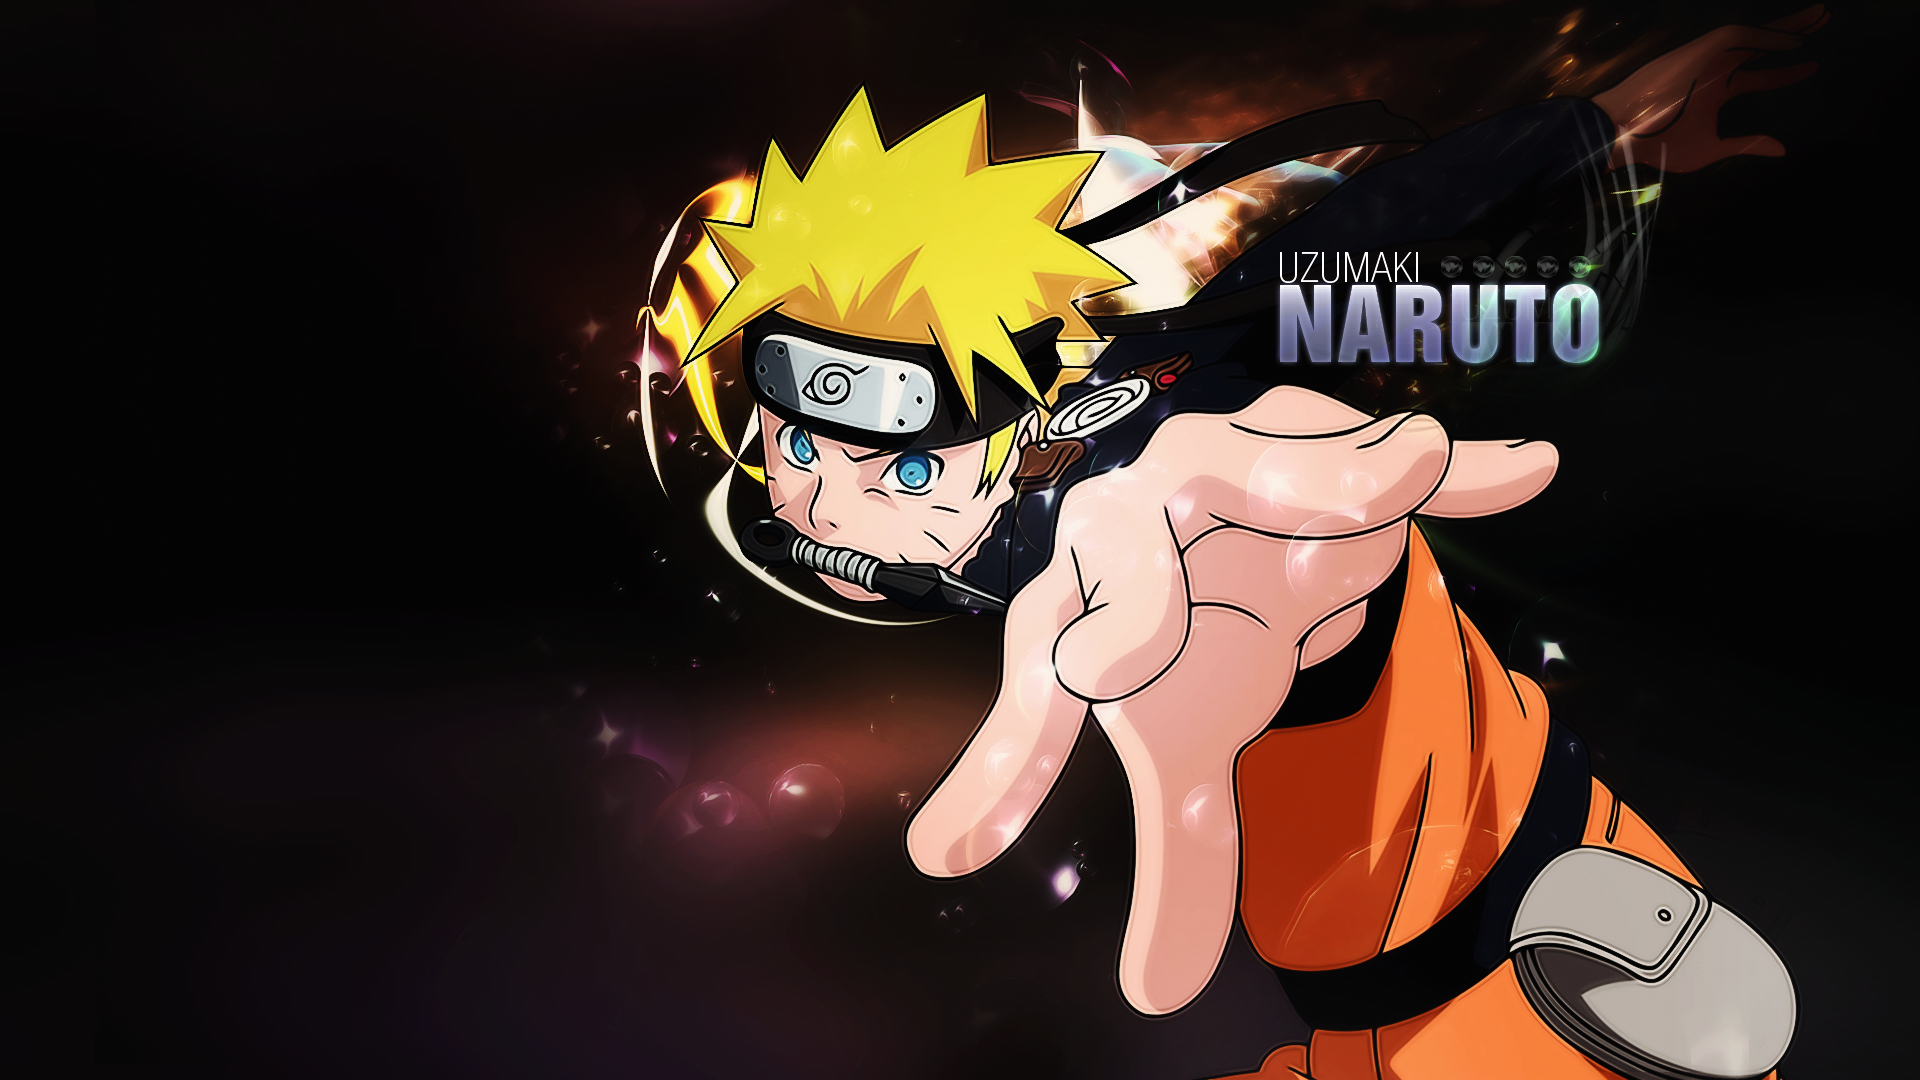 Naruto_shippuden_wallpaper_by_hemagoku.png (1920×1080)